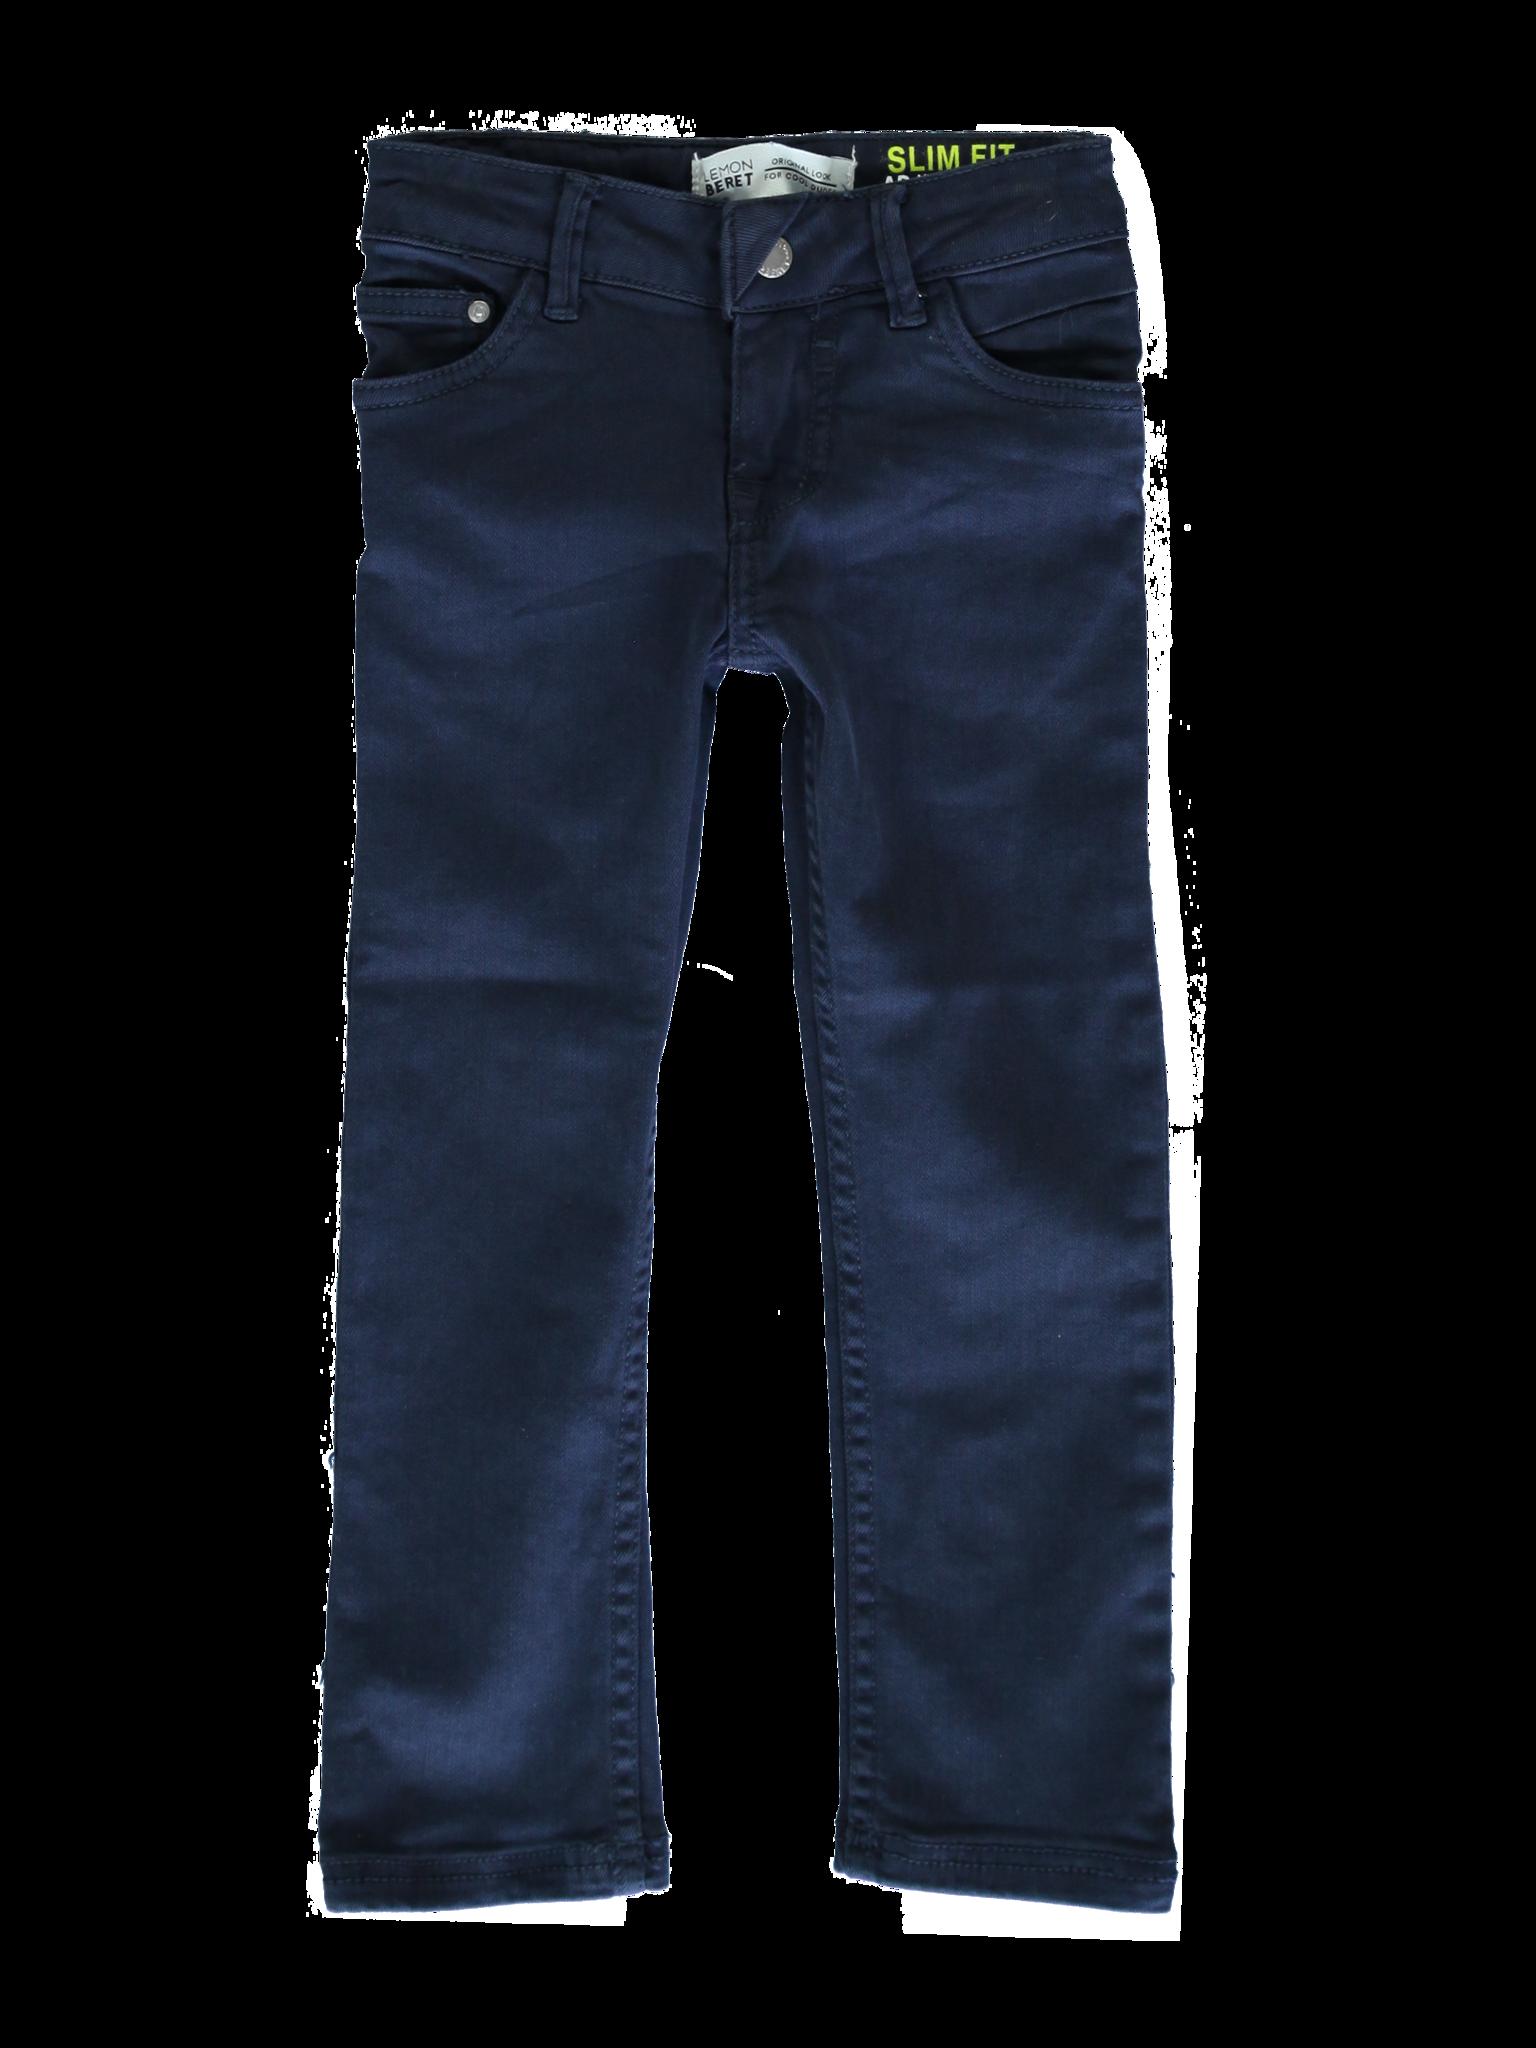 All Brands | Winterproducts Small Boys | Pants | 10 pcs/box